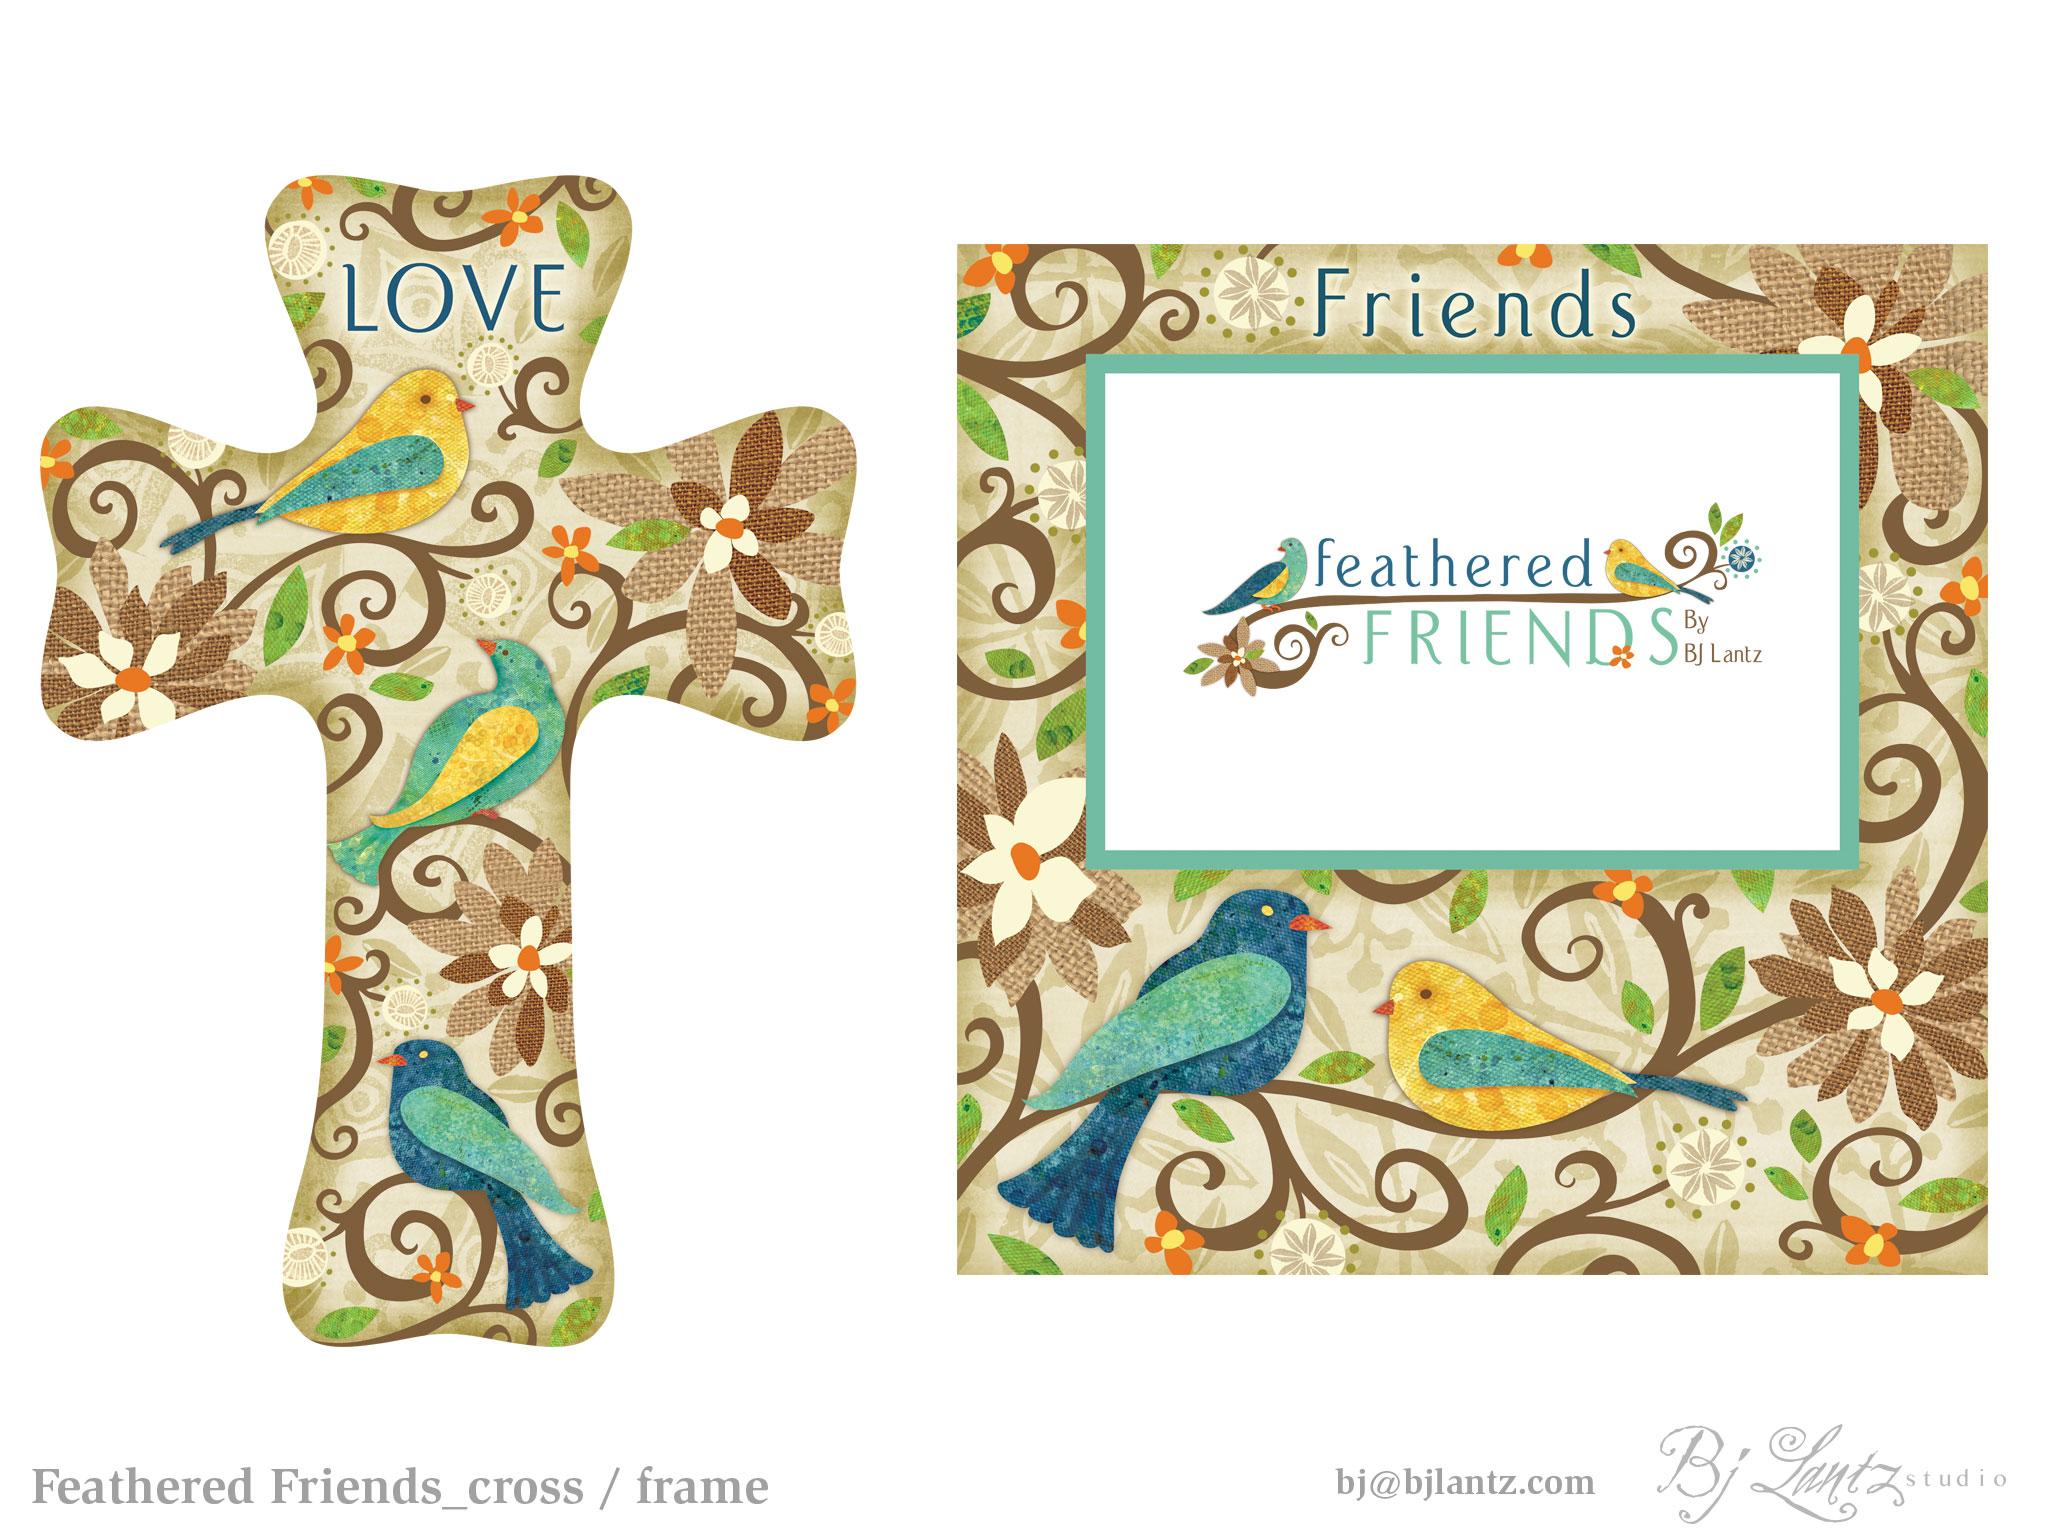 FeatheredFriends_7_BJLantz_portfolio.jpg